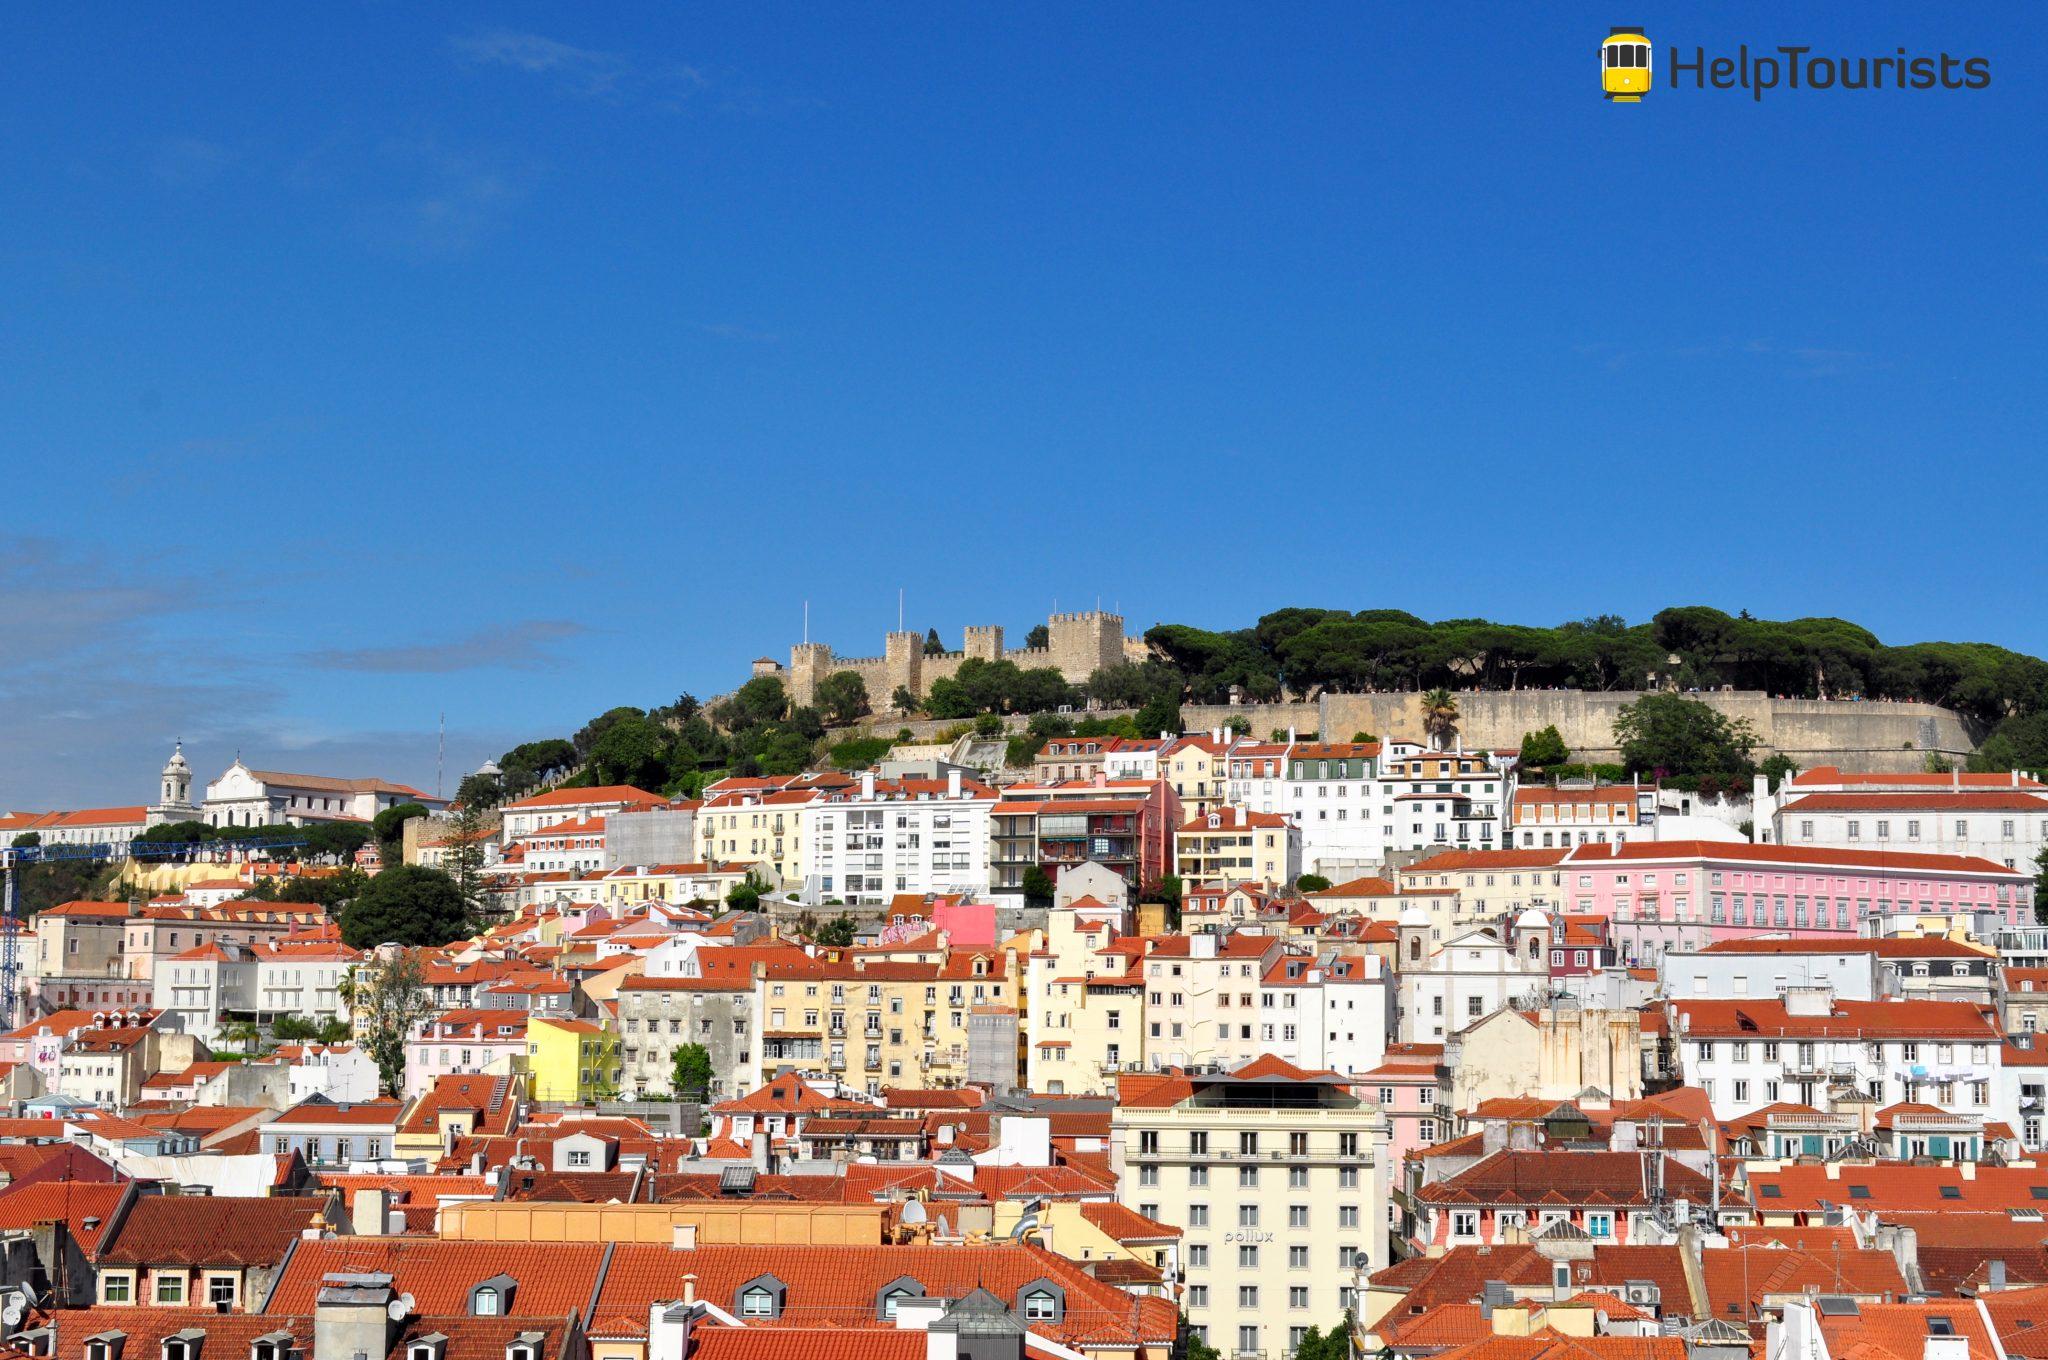 Lissabon Aussicht auf castelo de sao jorge